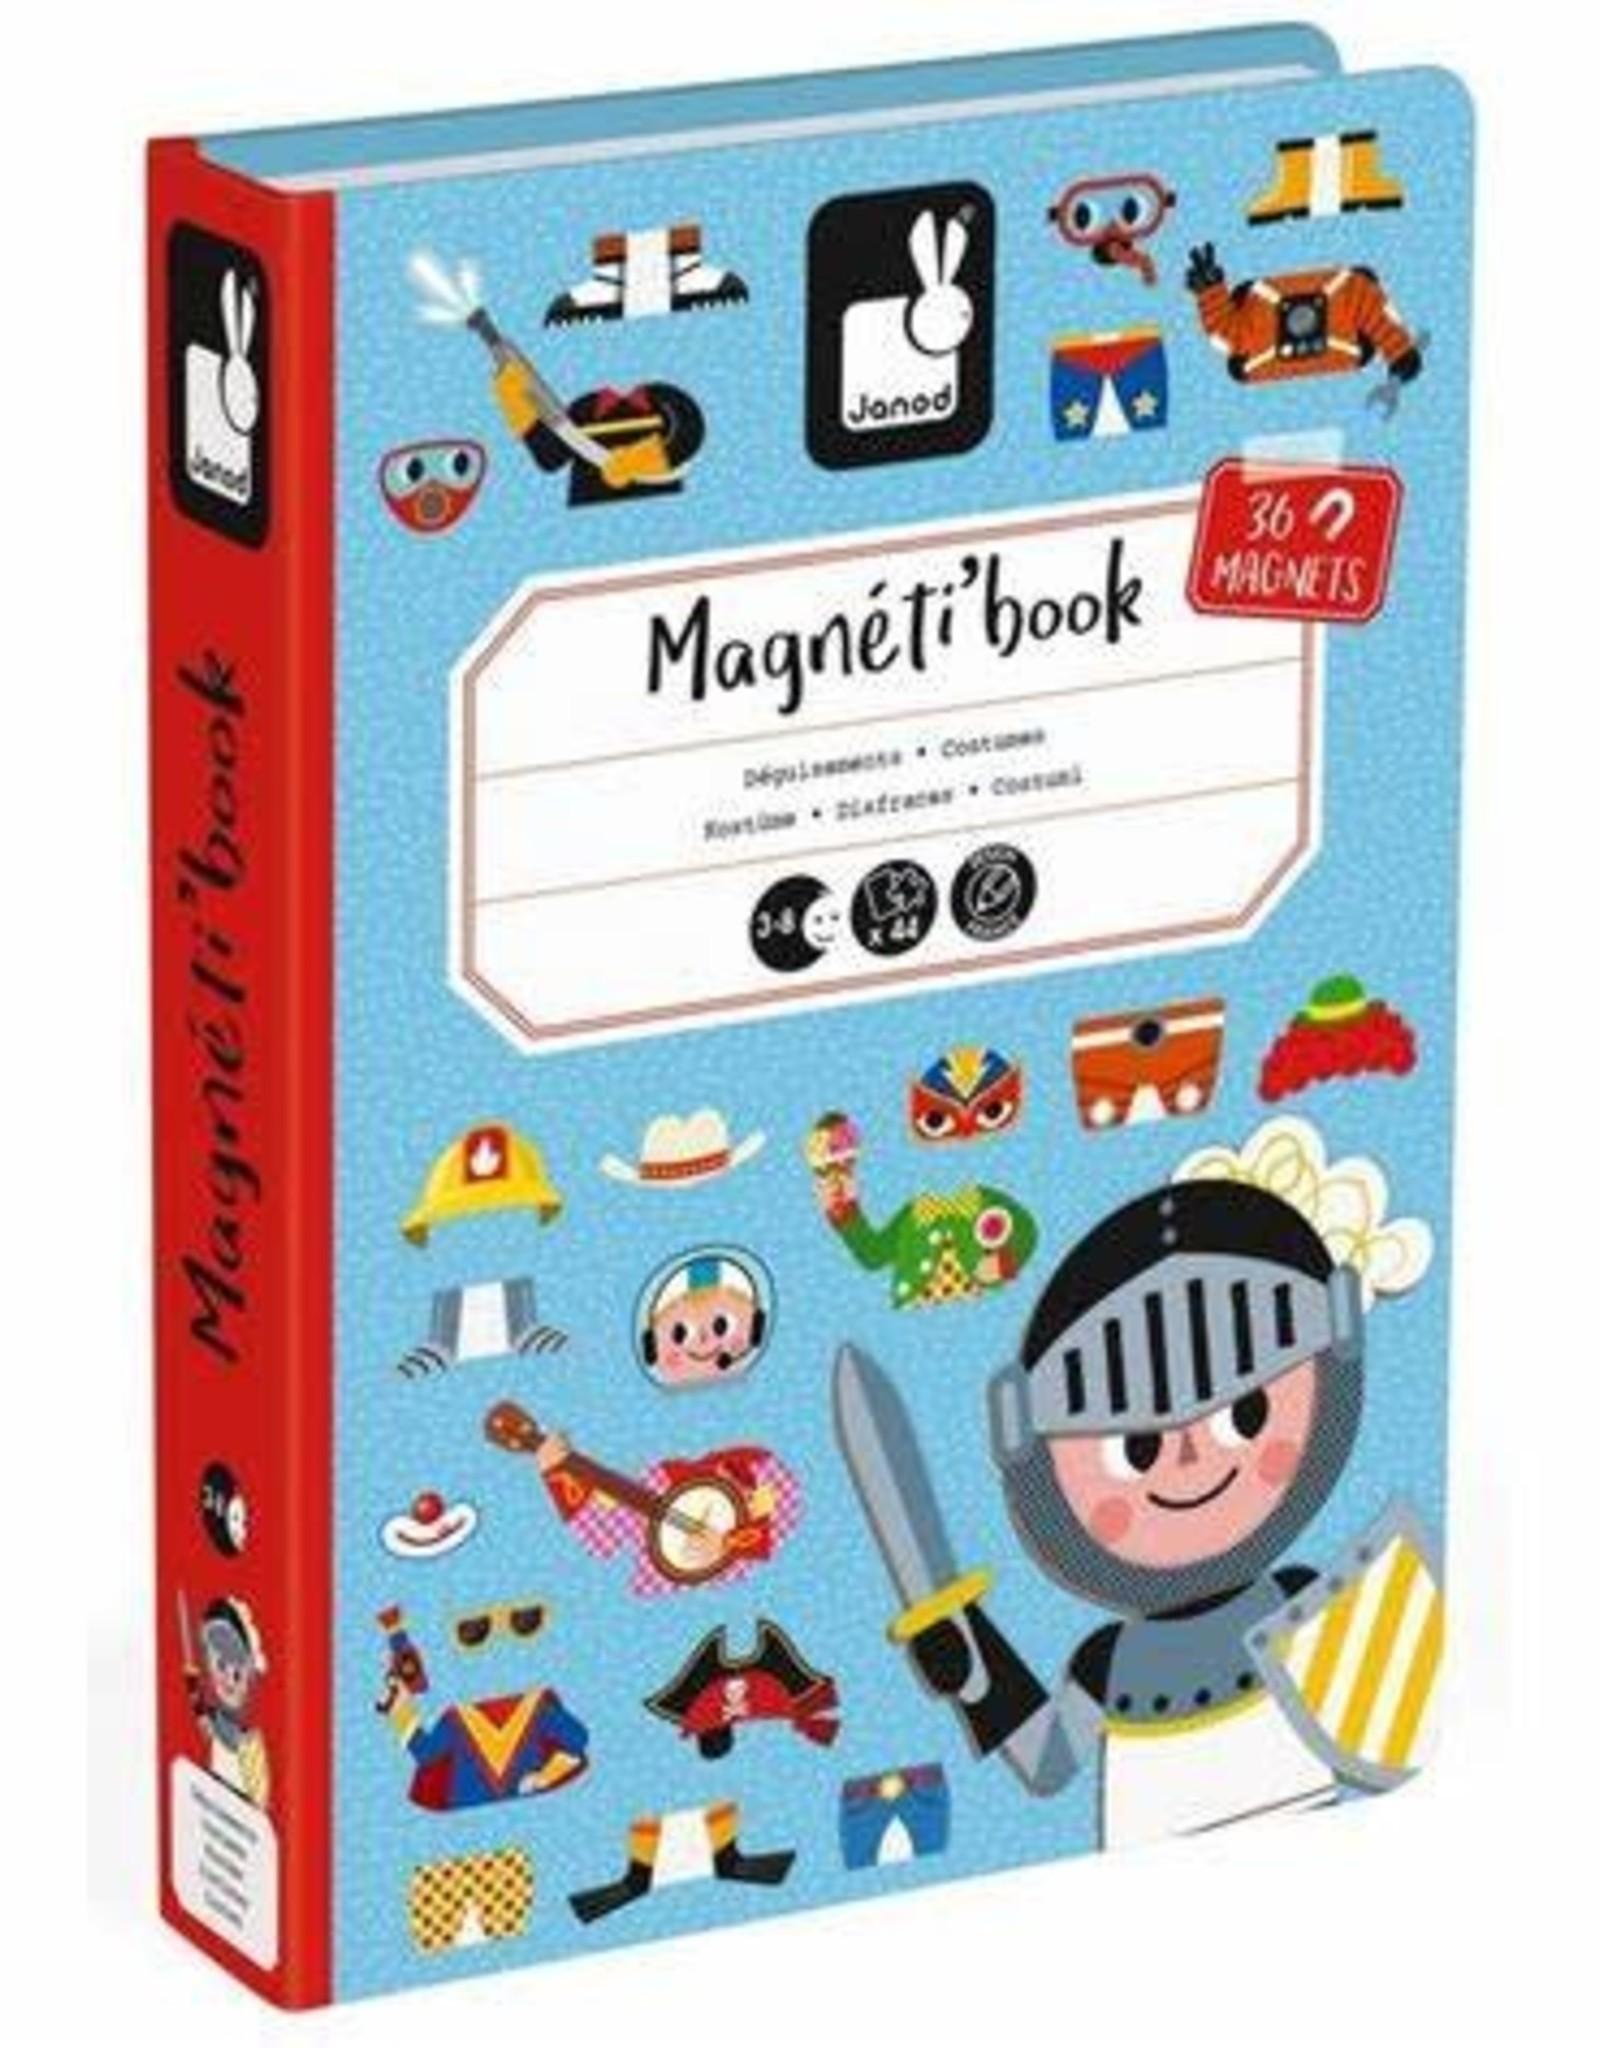 JURA Toys BOY'S COSTUMES MAGNETI'BOOK